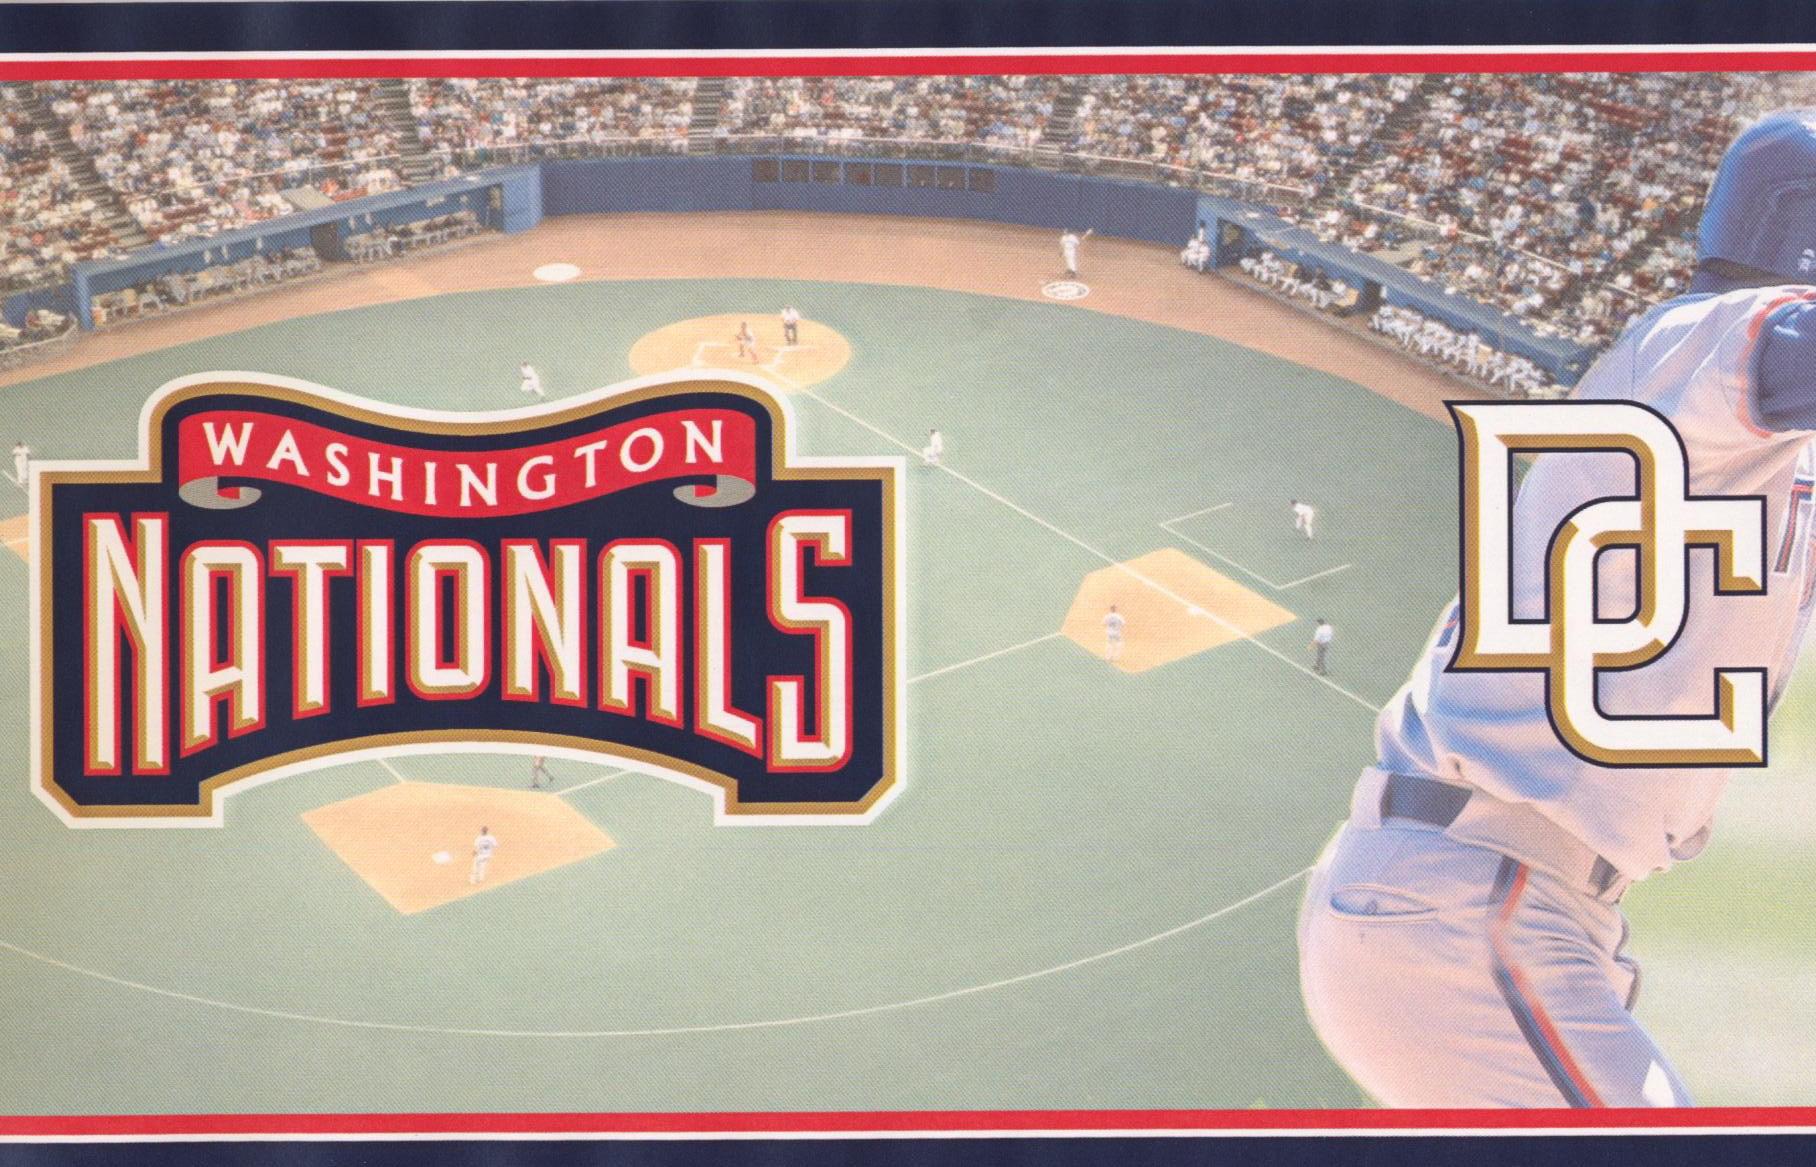 Washington Nationals Mlb Baseball Team Fan Sports Wallpaper Border Modern Design Roll 15 X 6 Walmart Canada